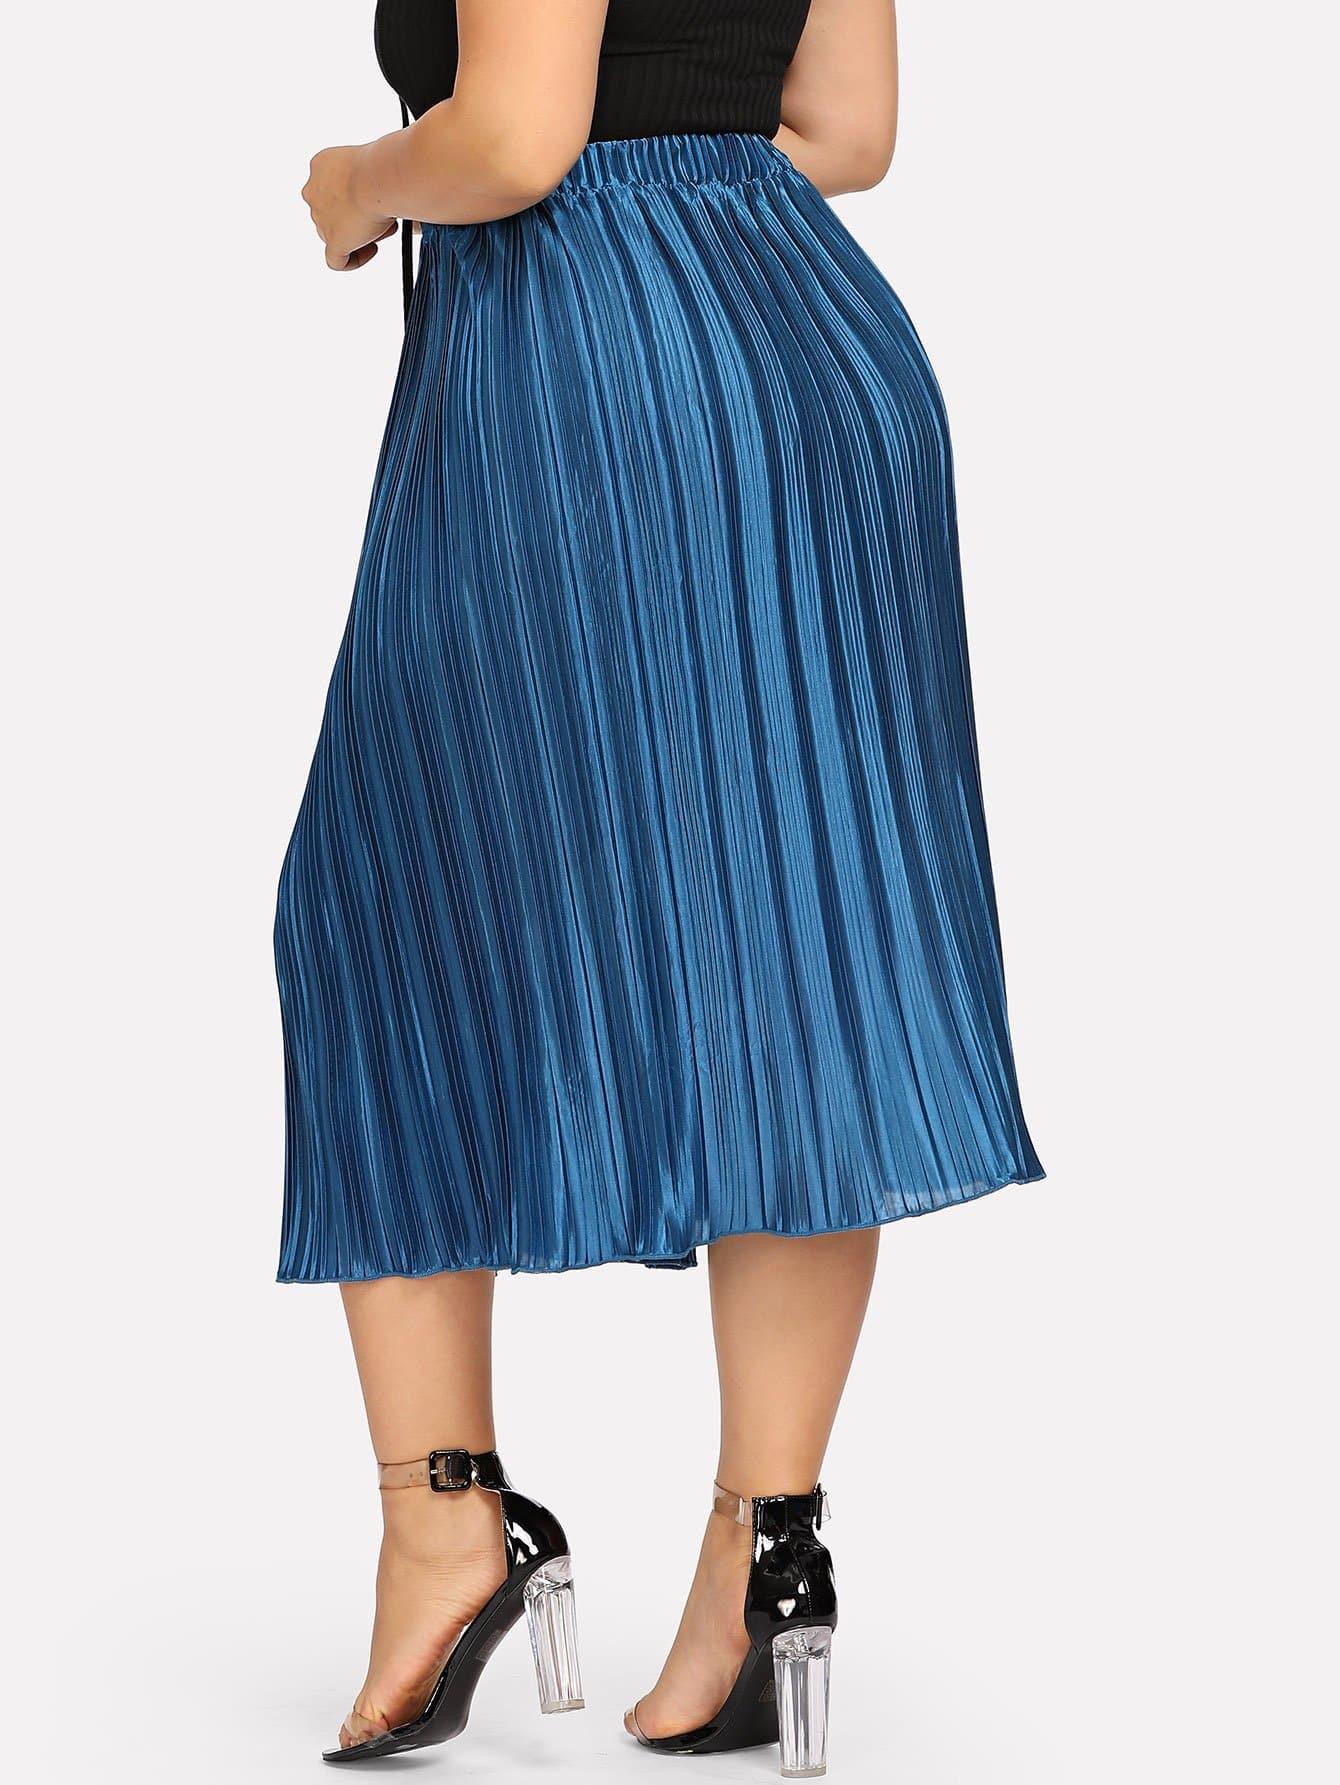 grande taille jupe pliss e taille lastique shein france